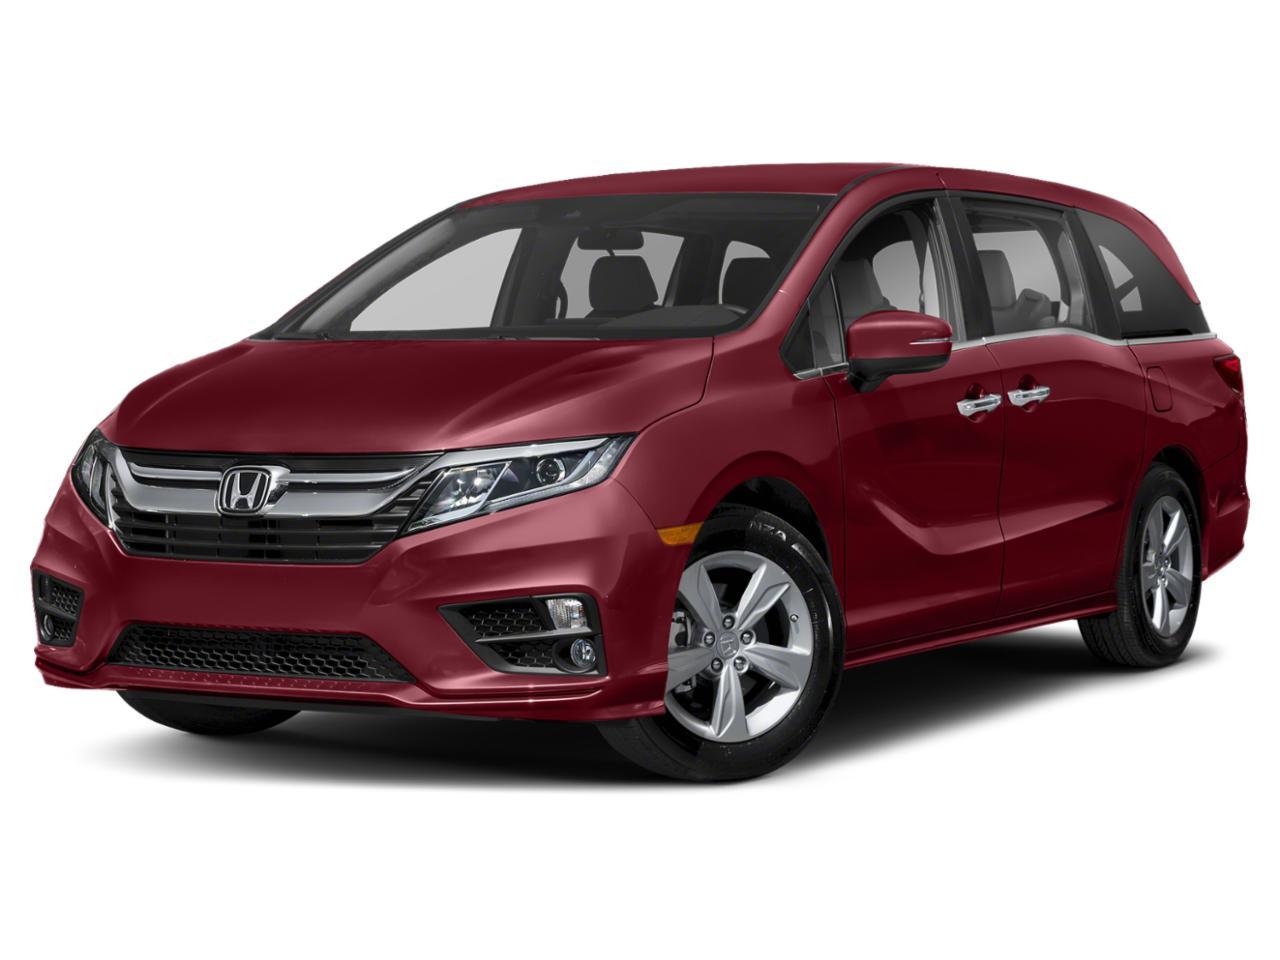 2019 Honda Odyssey Vehicle Photo in Colorado Springs, CO 80920